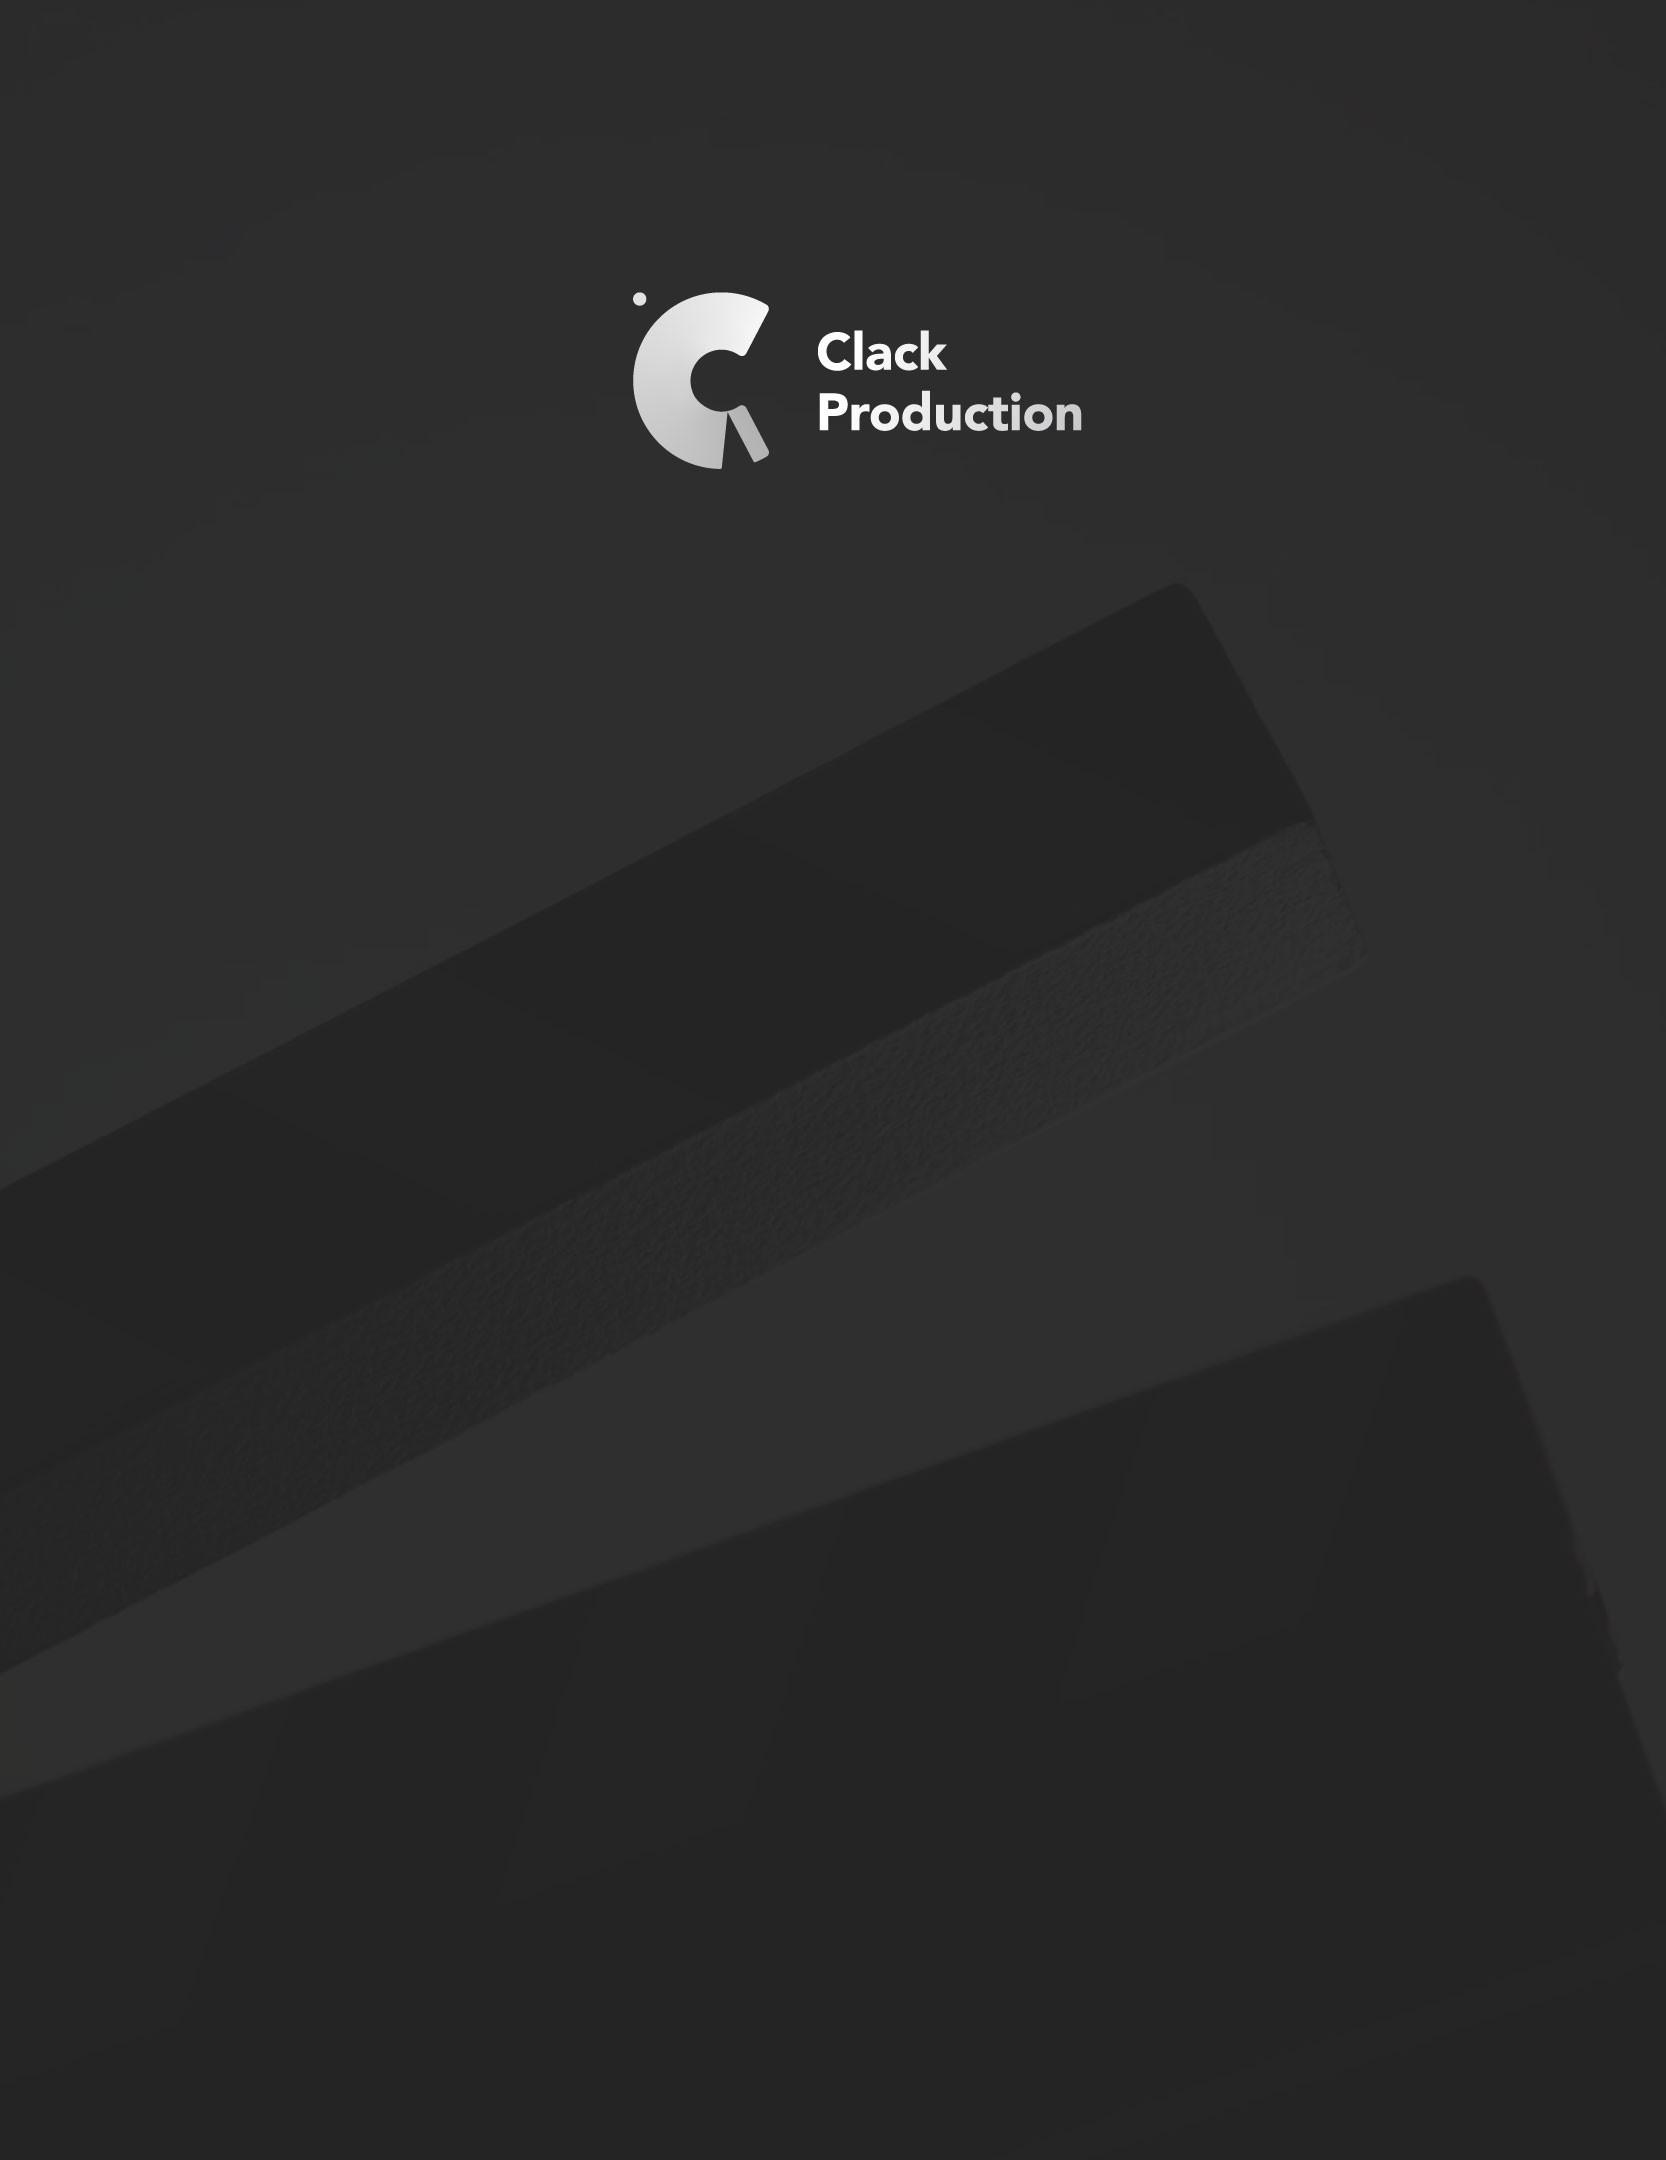 White logo version